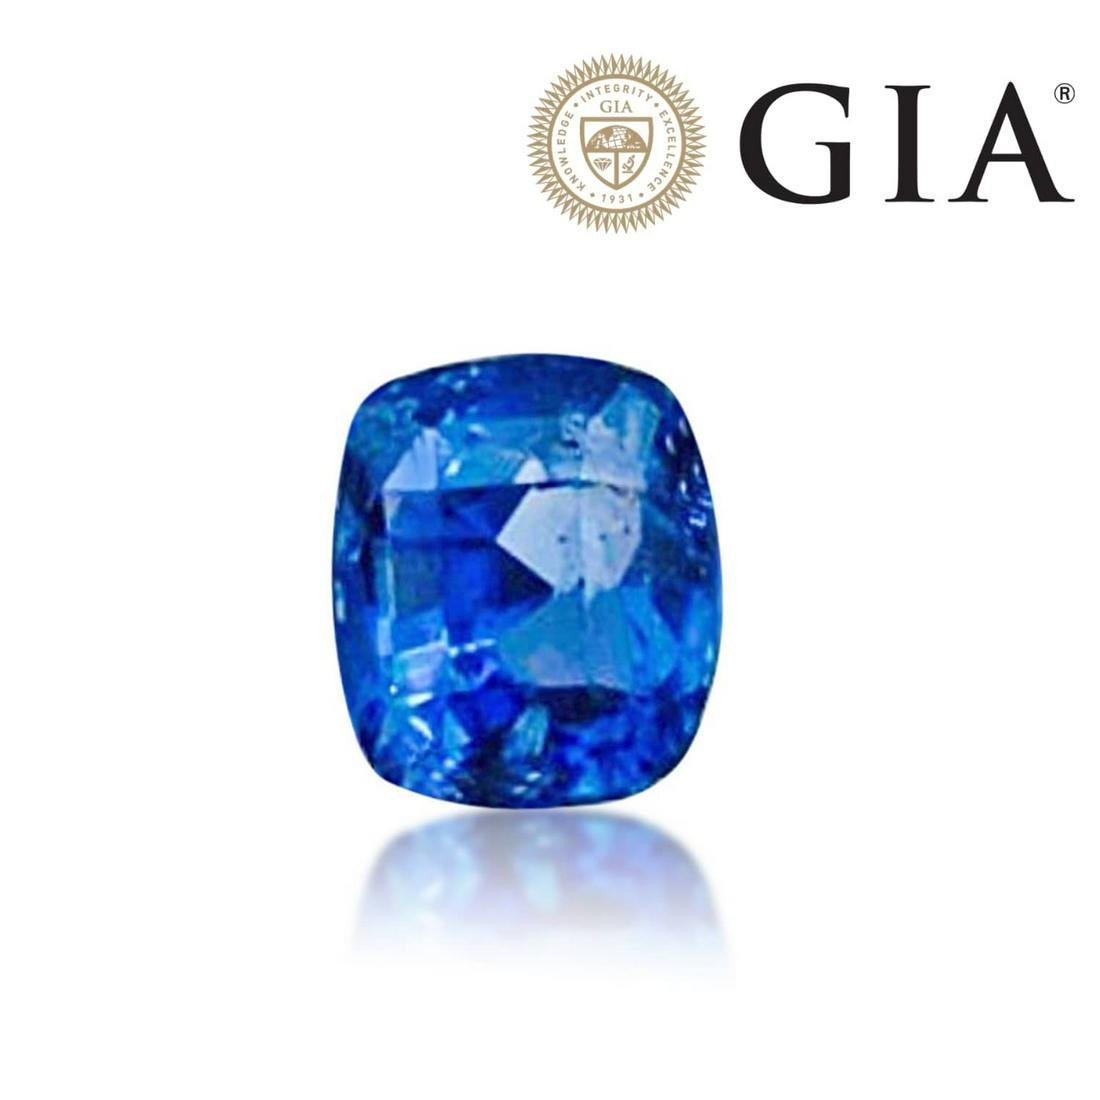 GIA certified, 7.02 carat no heat blue sapphire loose